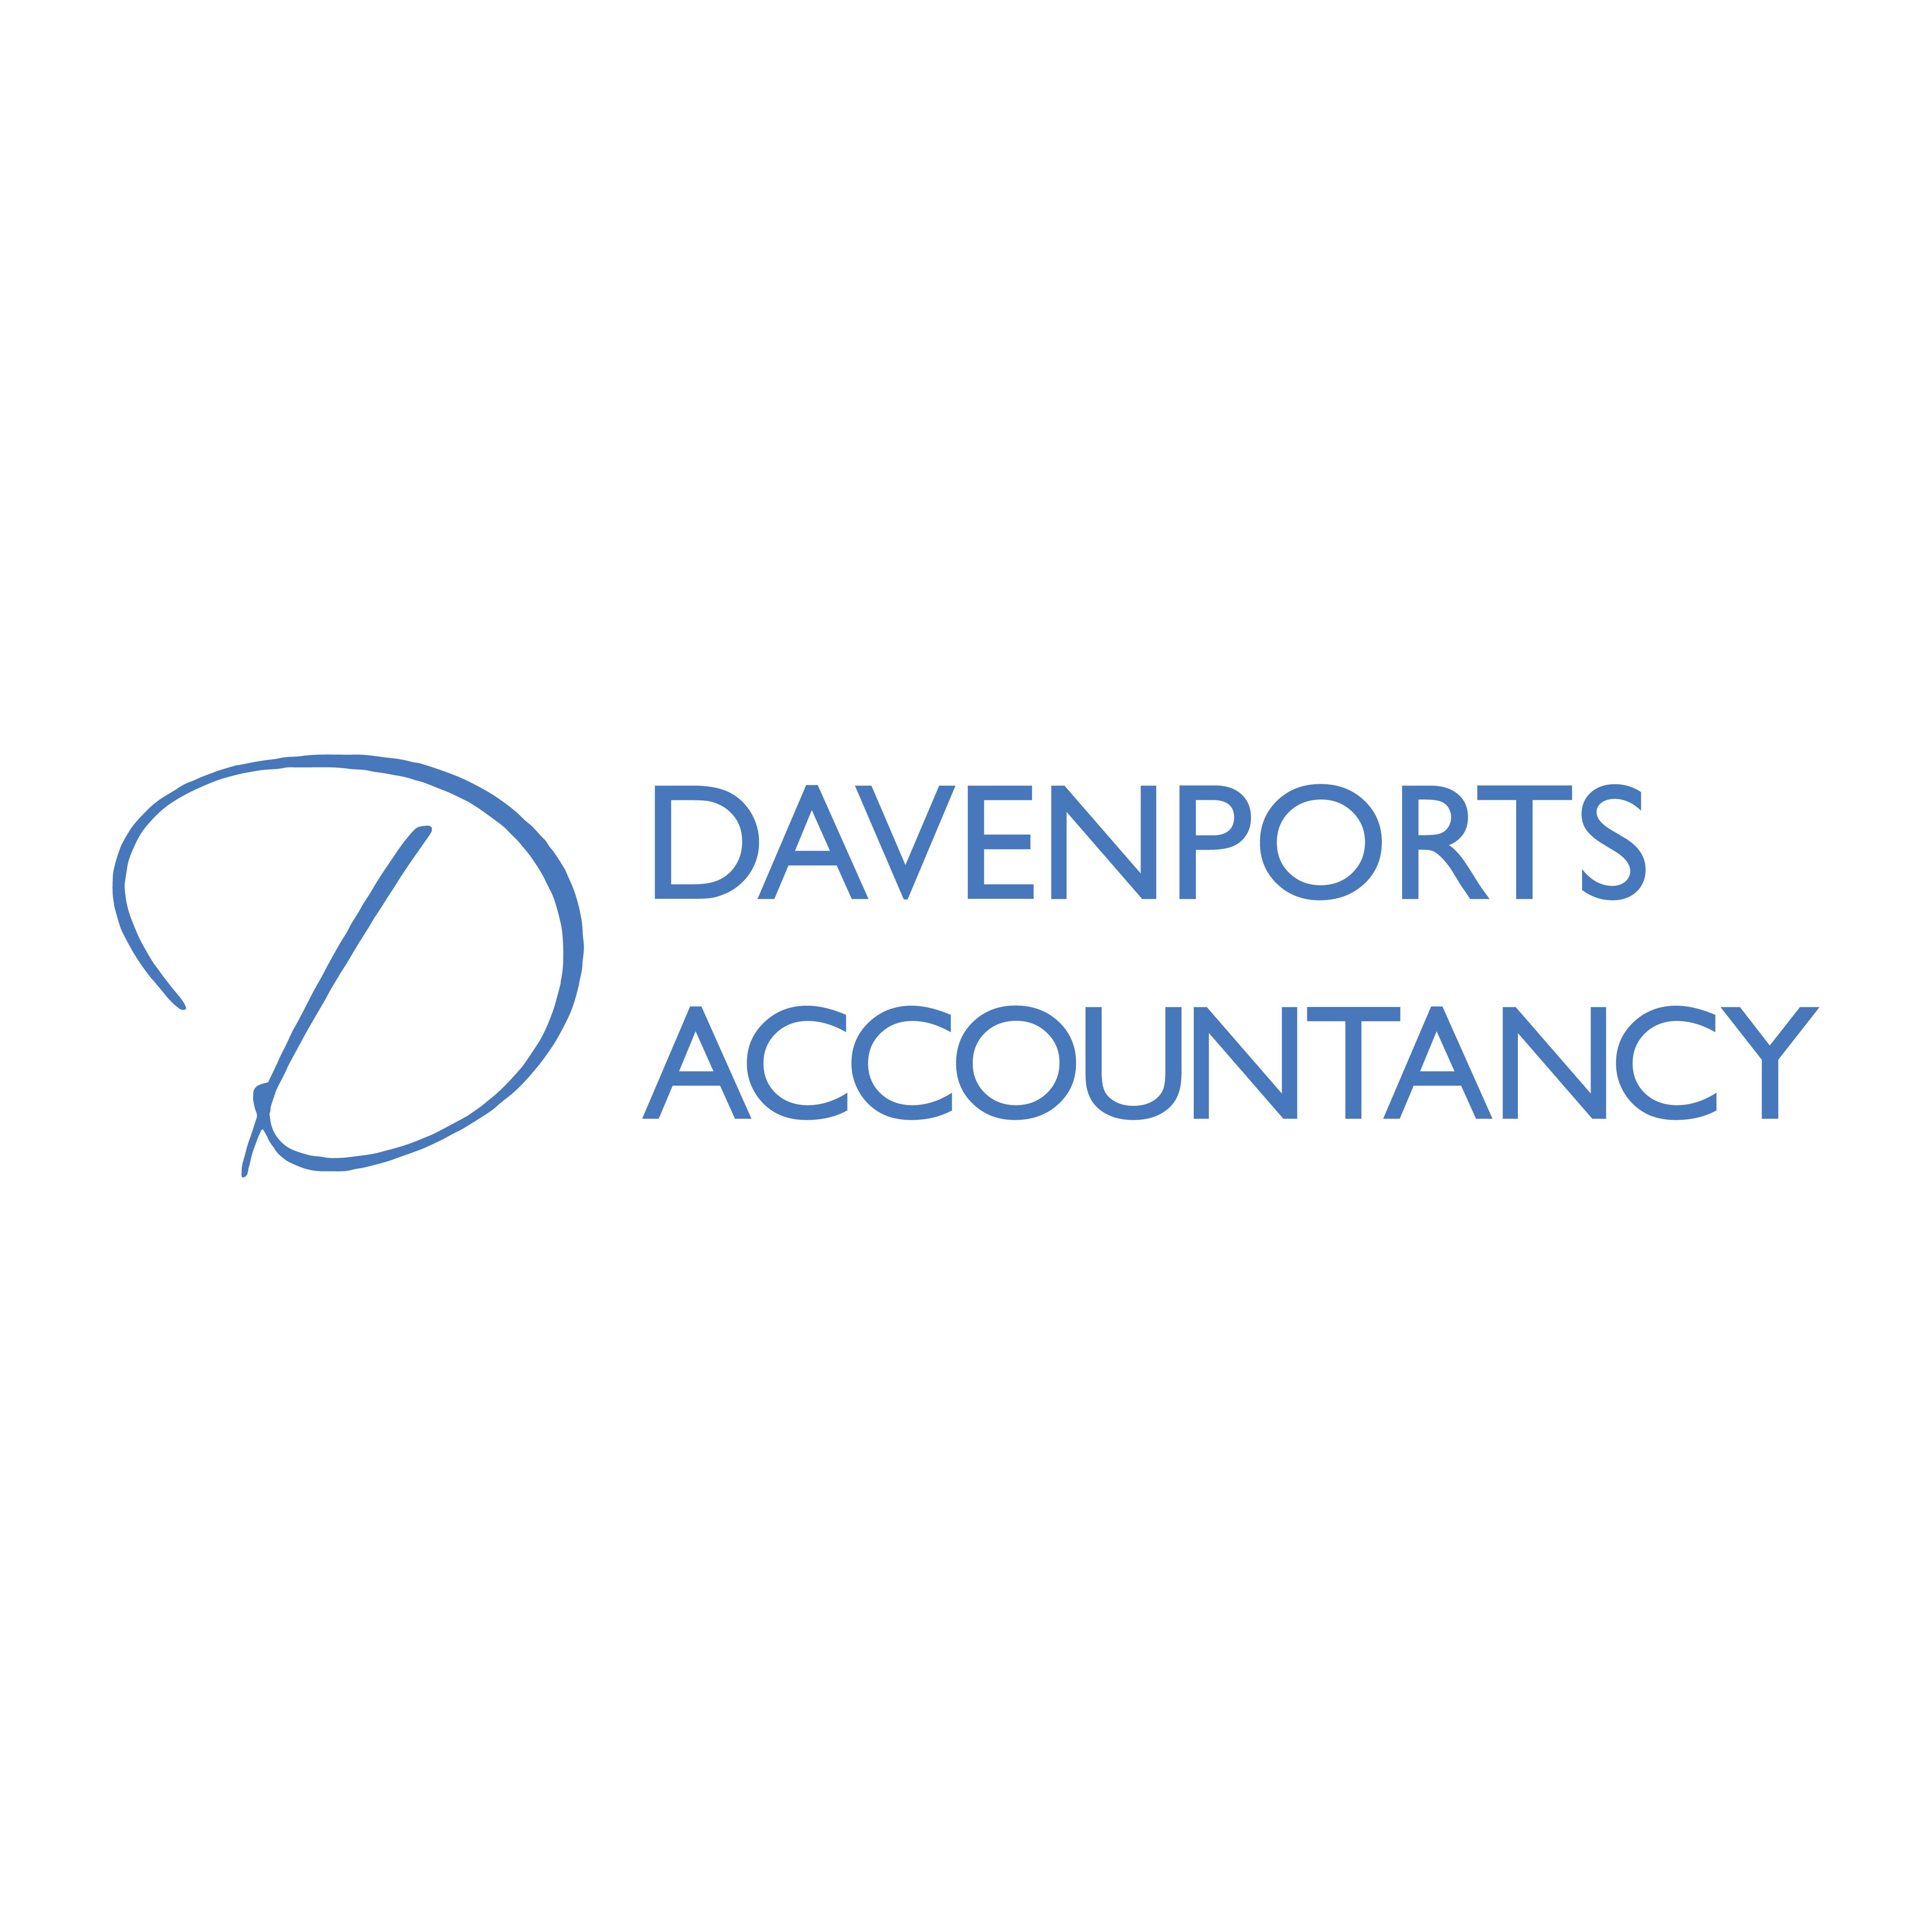 Davenports Accountancy